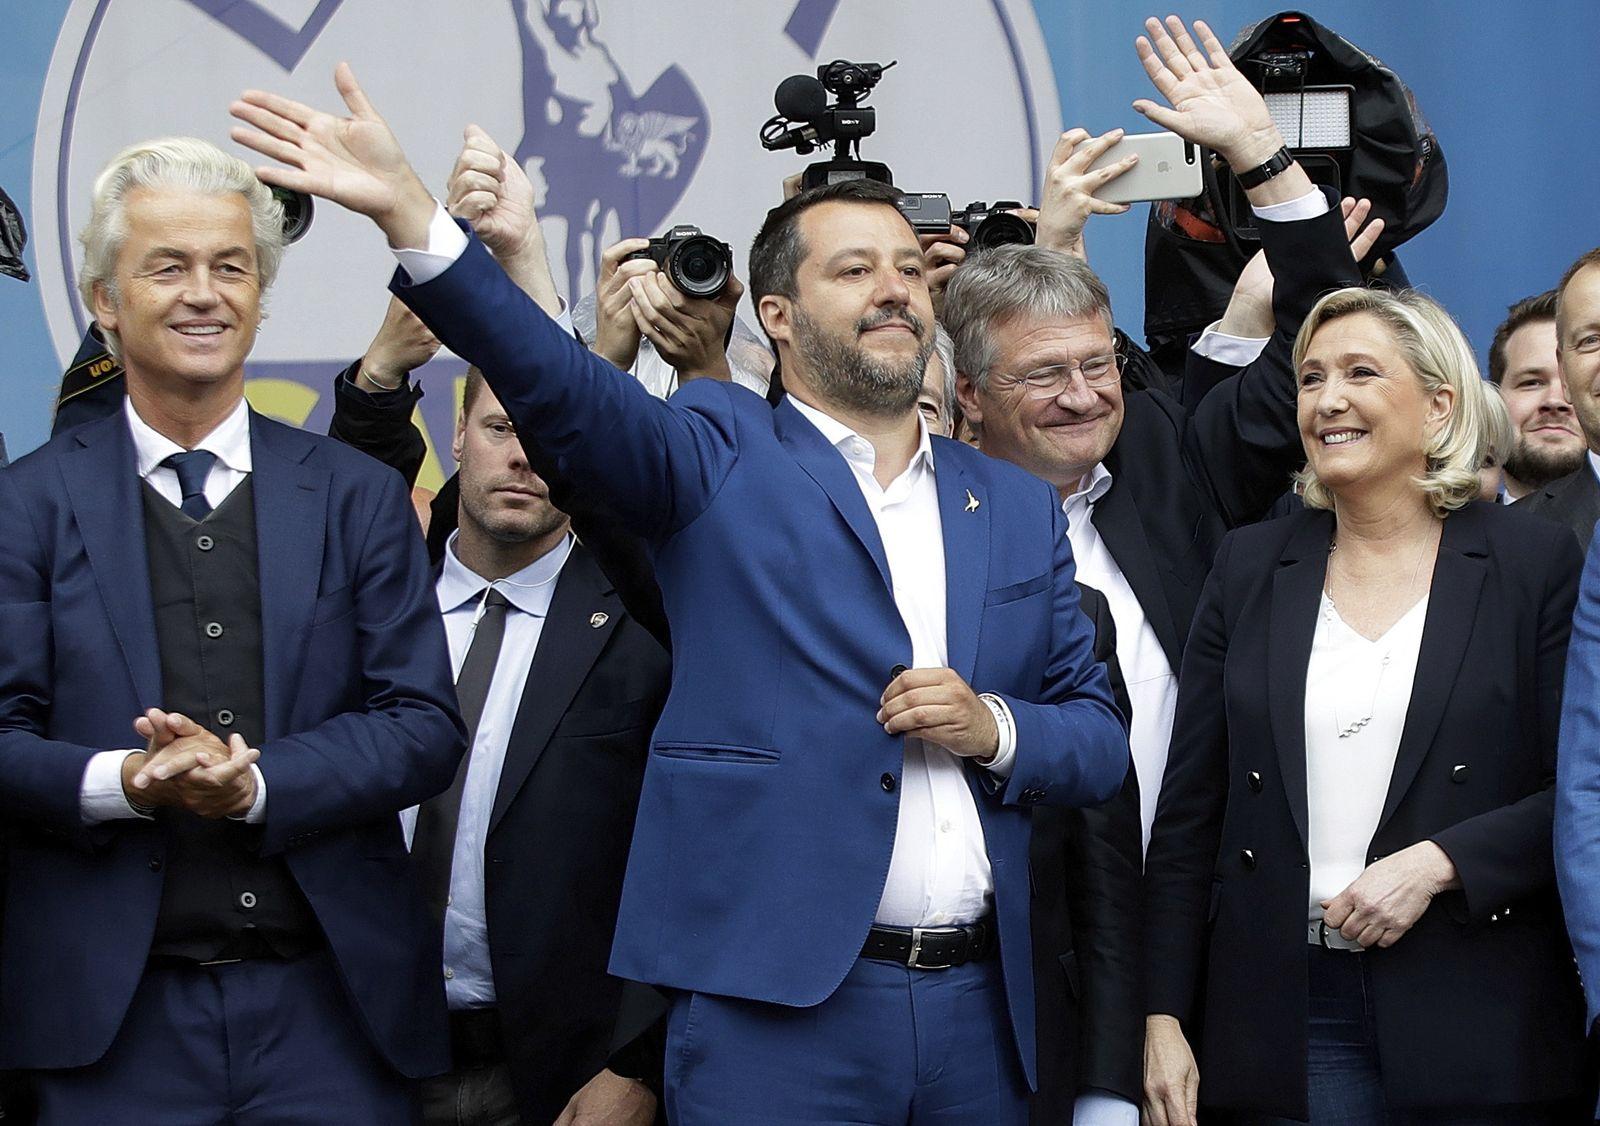 Geert Wilders, Matteo Salvini, Jörg Meuthen, Marine Le Pen